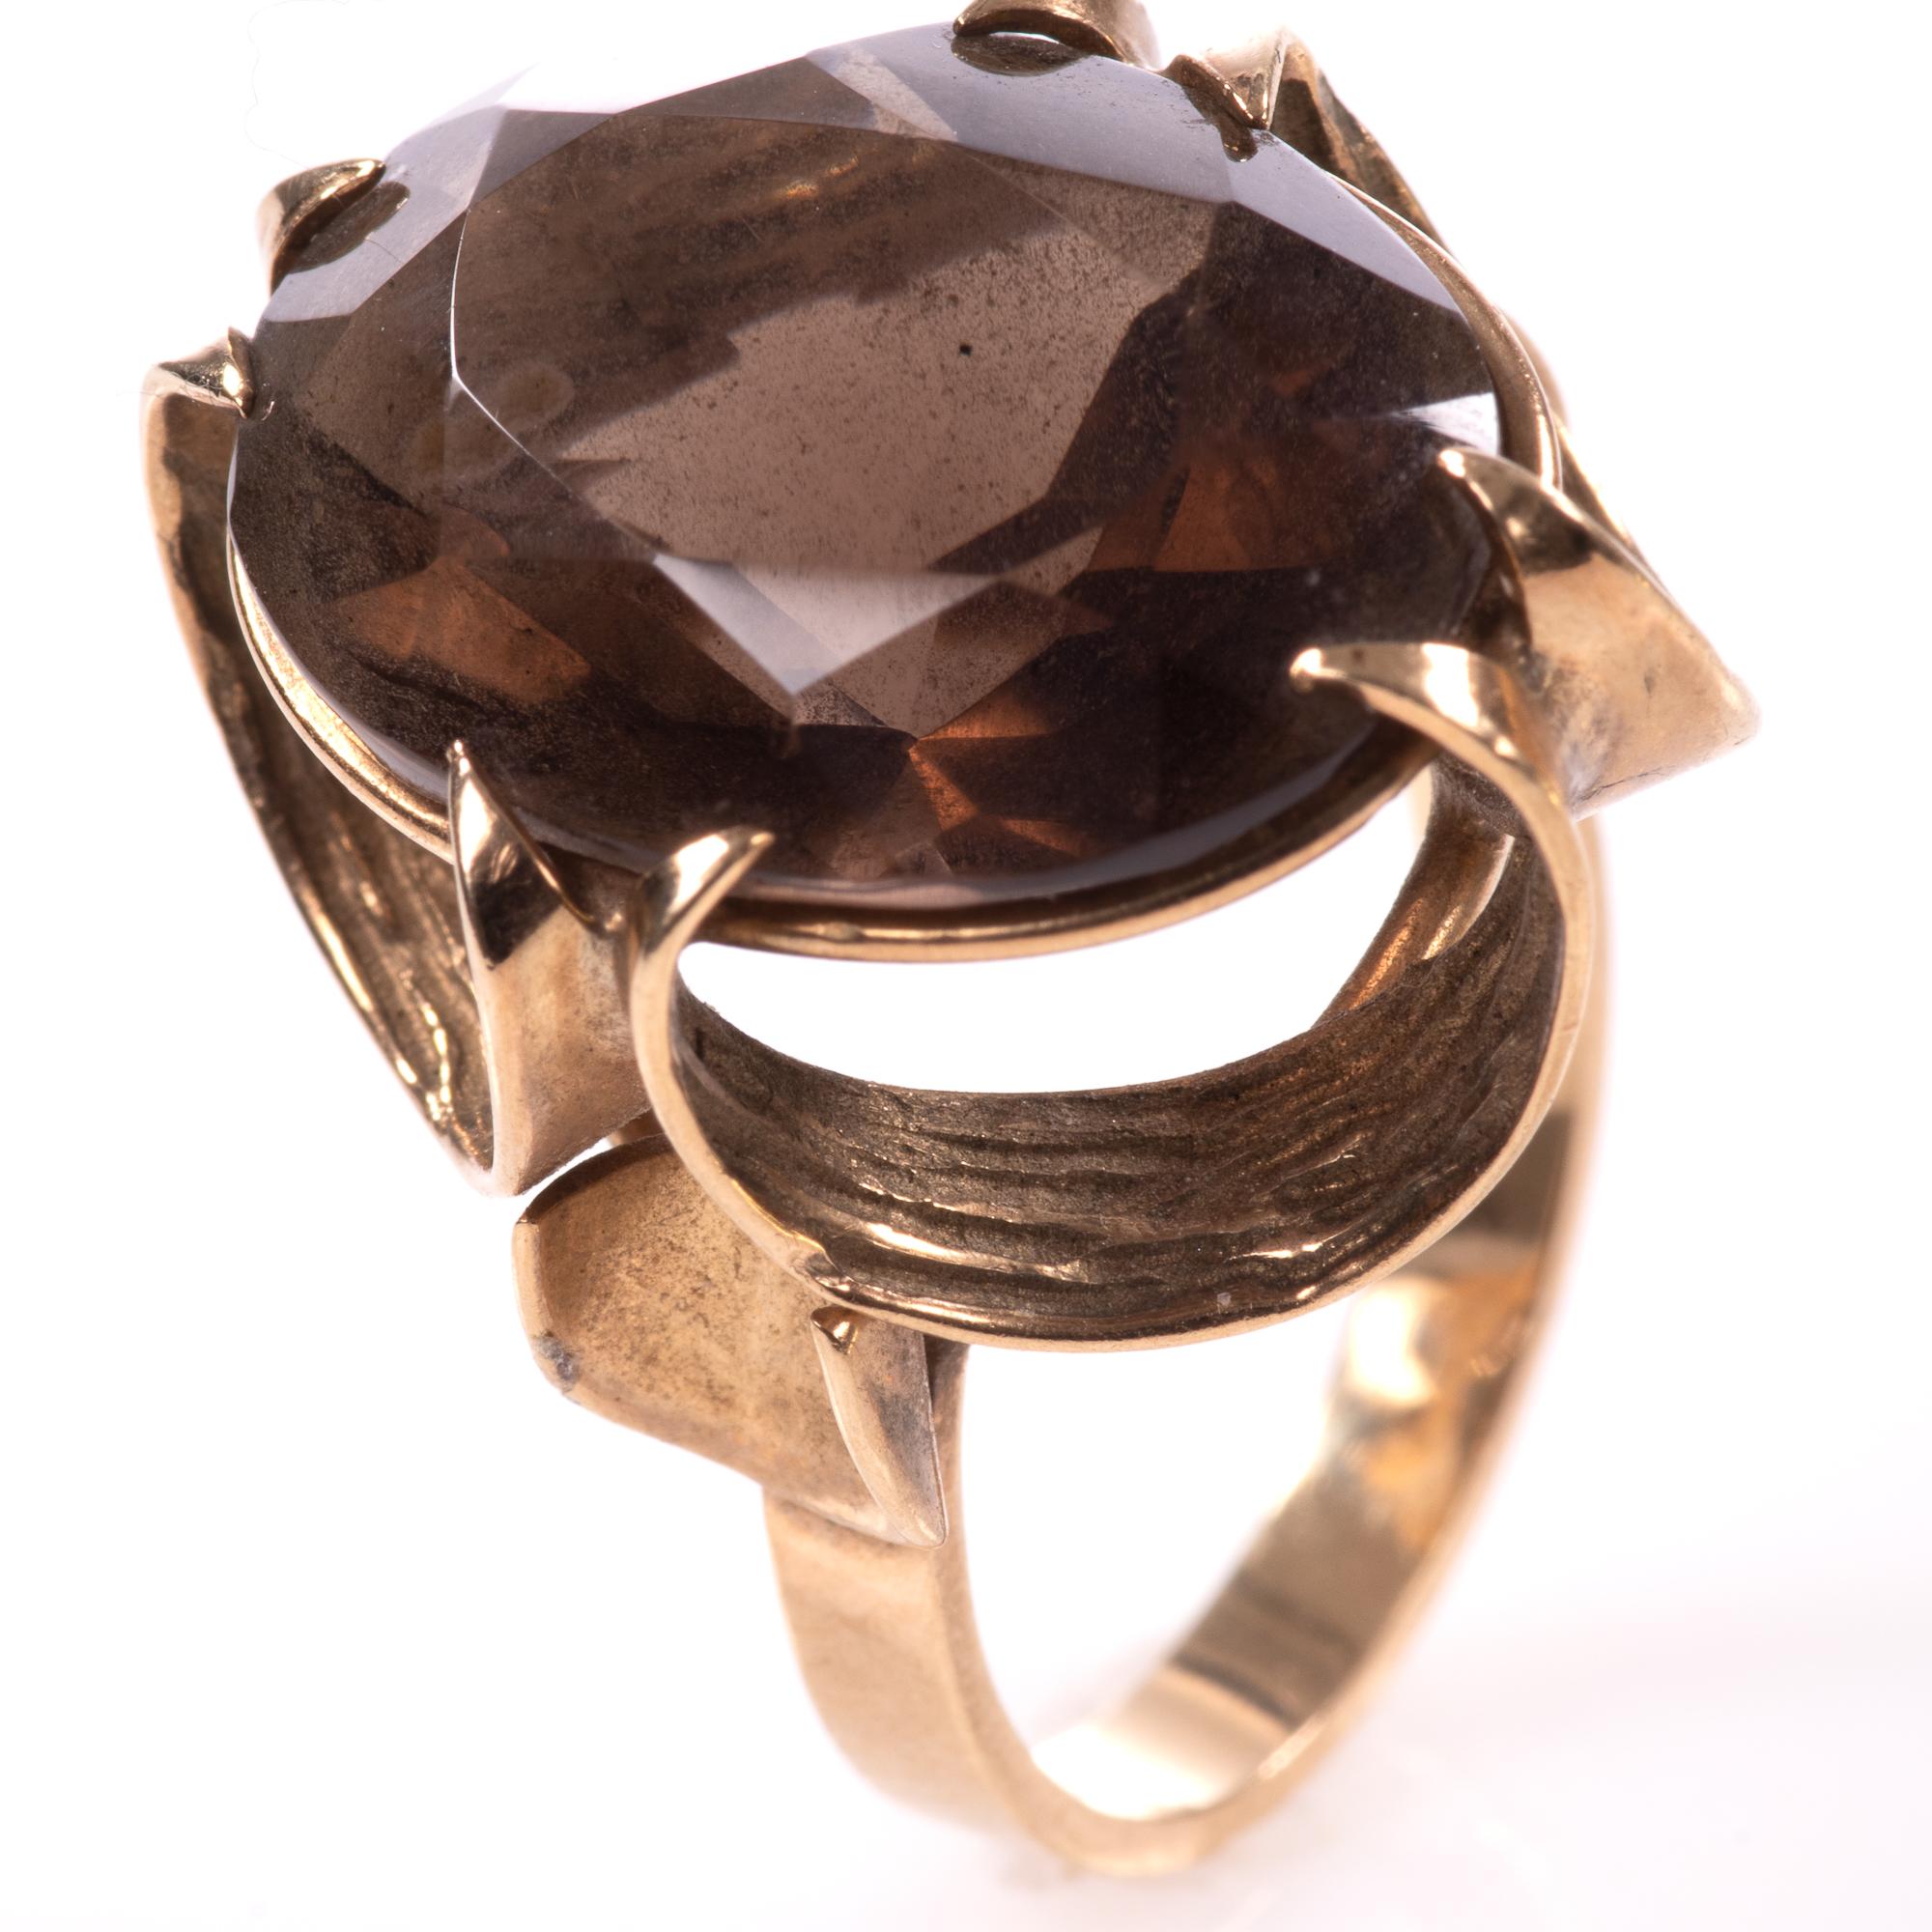 9ct Gold 12.75ct Smoky Quartz Ring